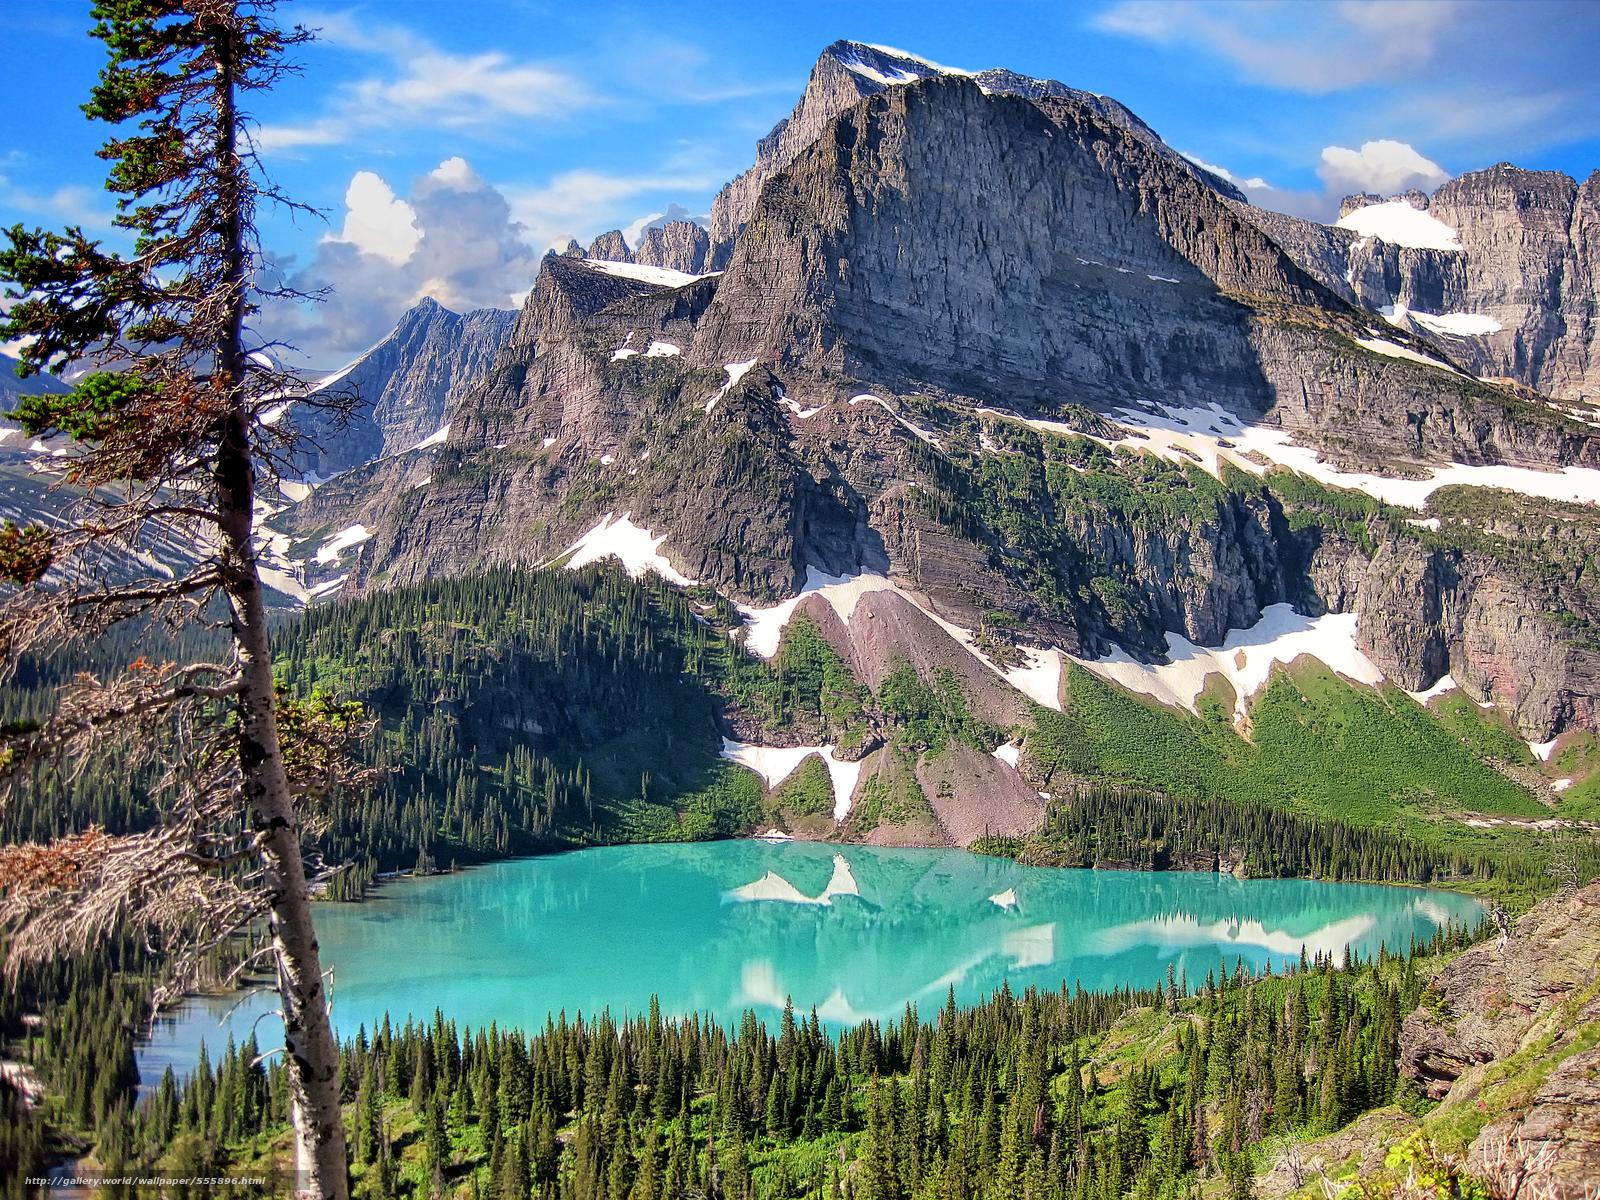 Download wallpaper Glacier National Park Mountains lake landscape 1600x1200